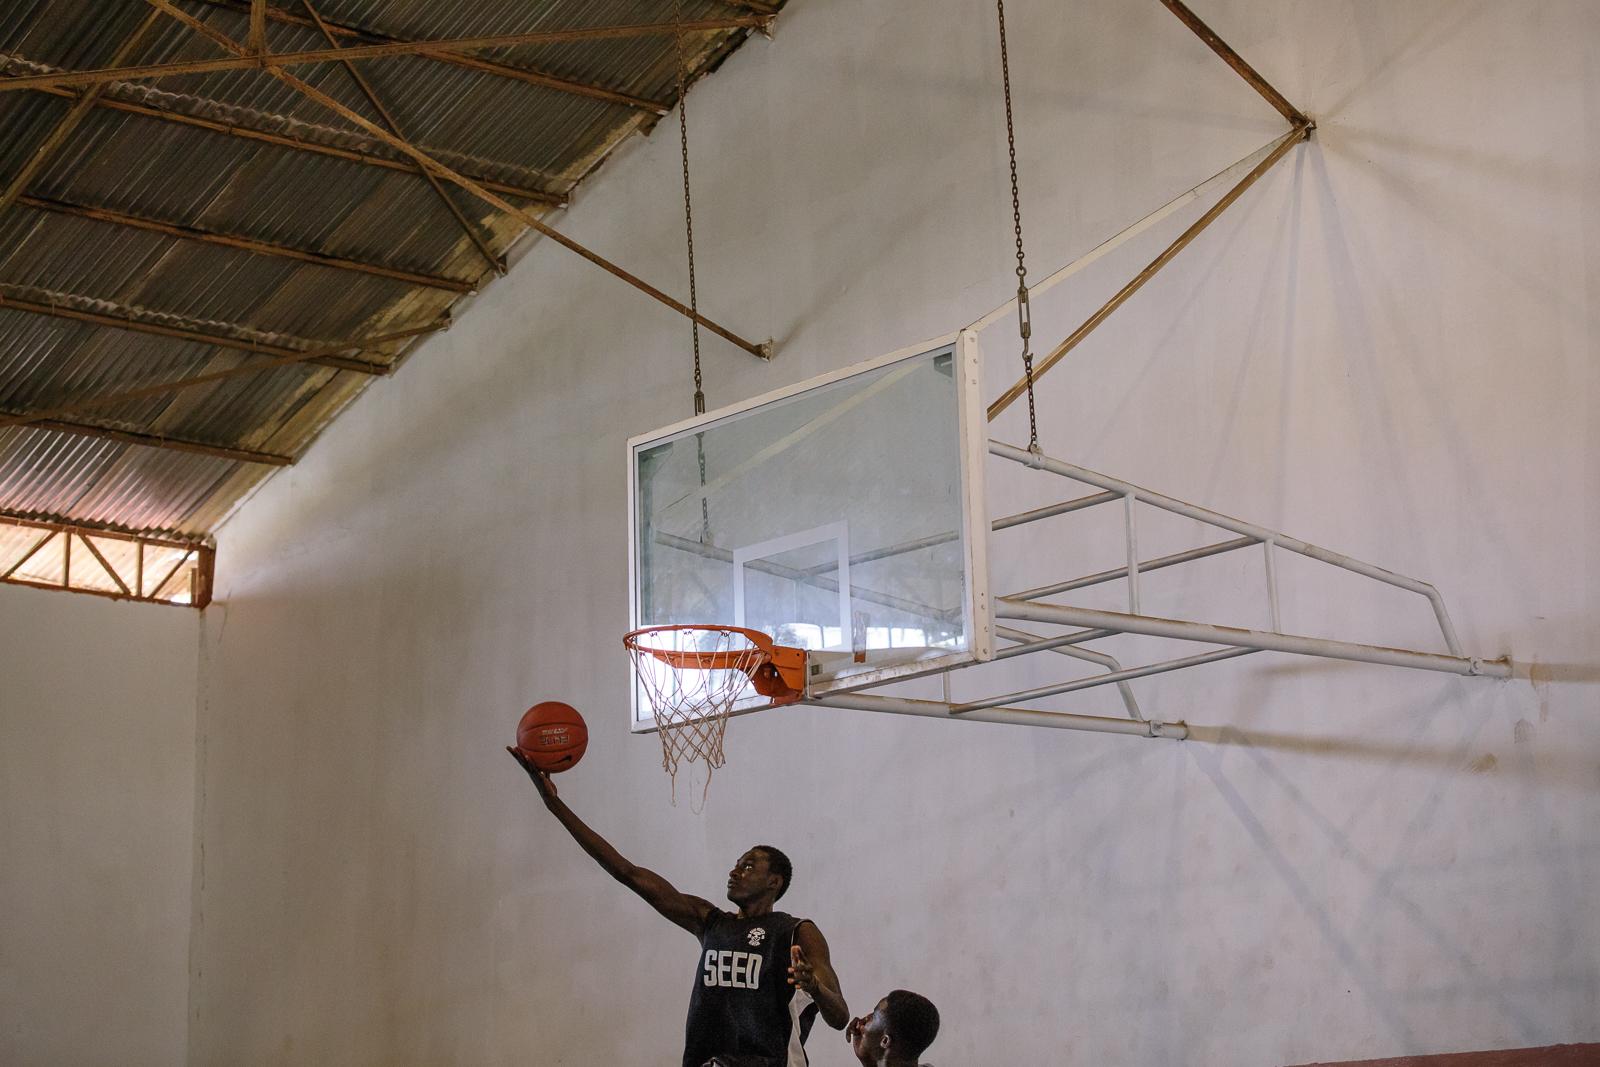 0141_20150531_Seed Academy_thiès_Senegal©KevinCouliau.jpg